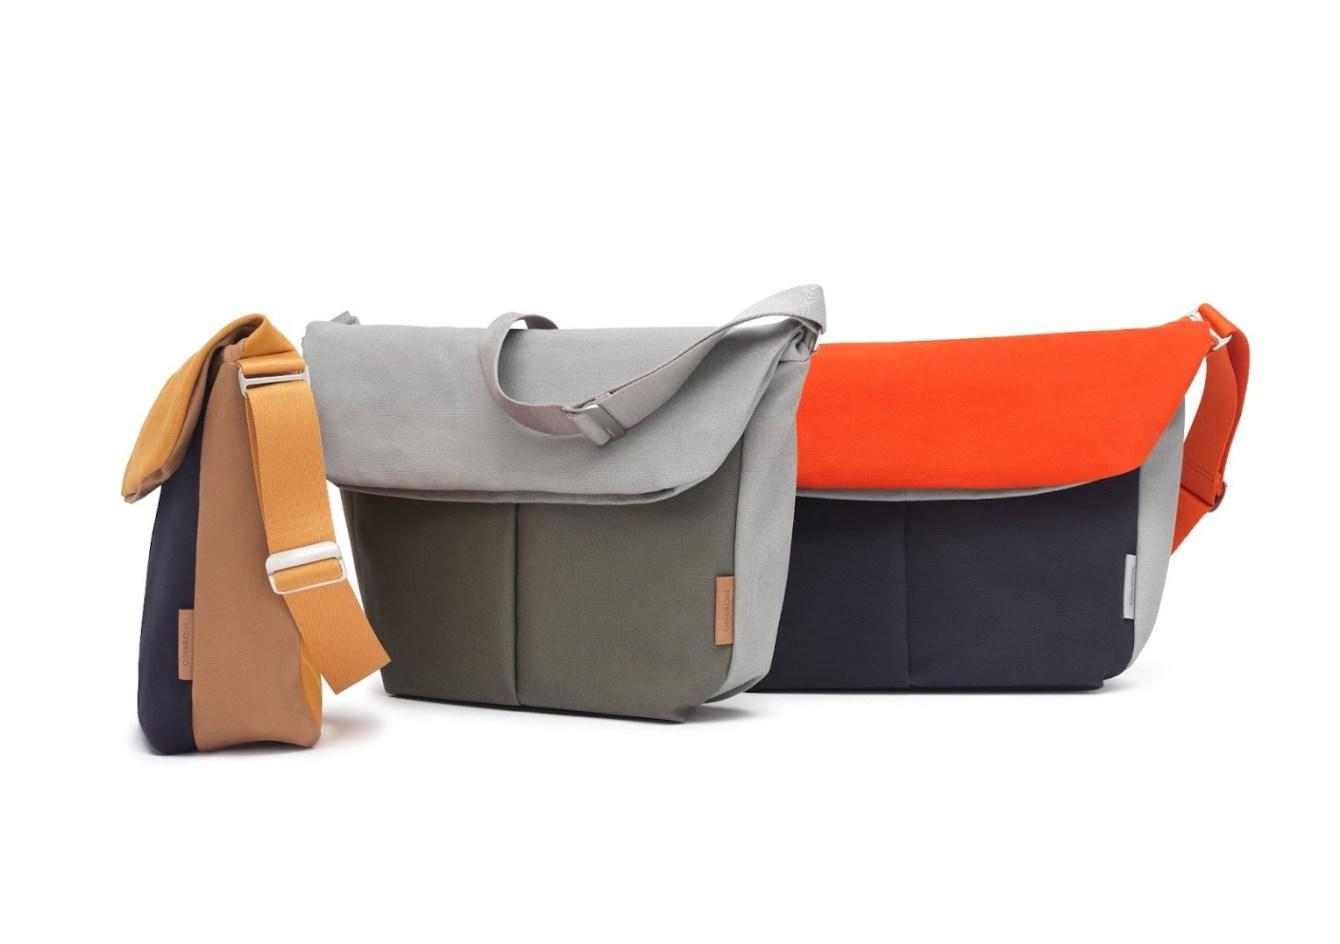 *Côte&Ciel突破單色印象:與日本Beams推出Spree Messenger Bag! 2